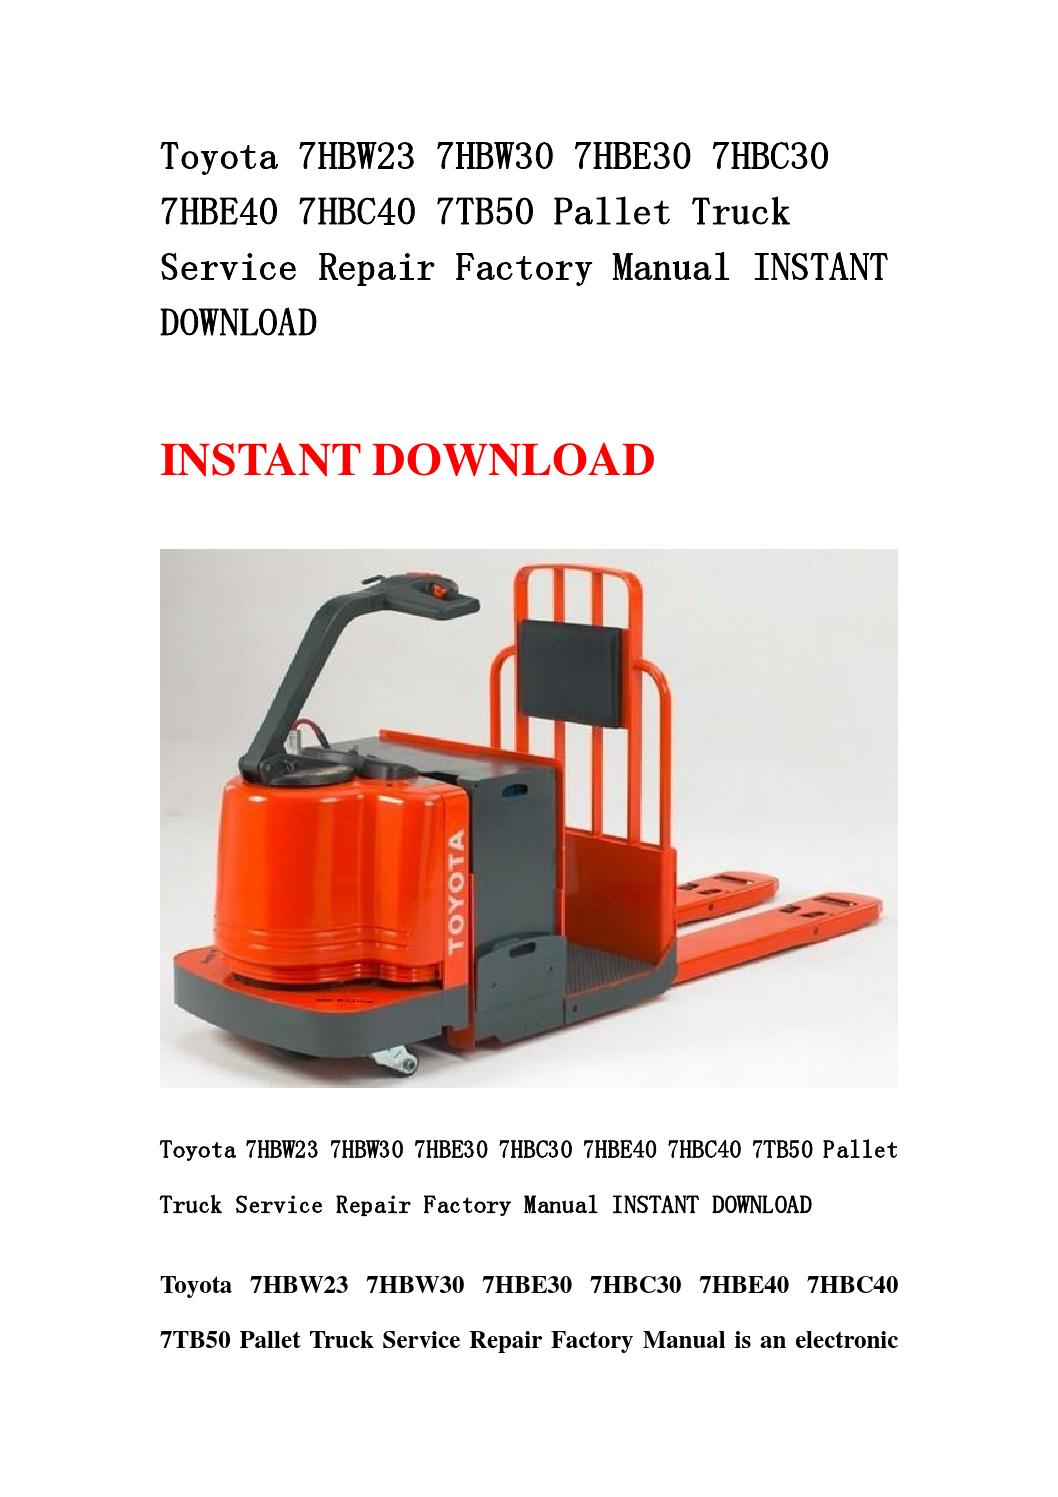 Toyota 7hbw23 Service Manual